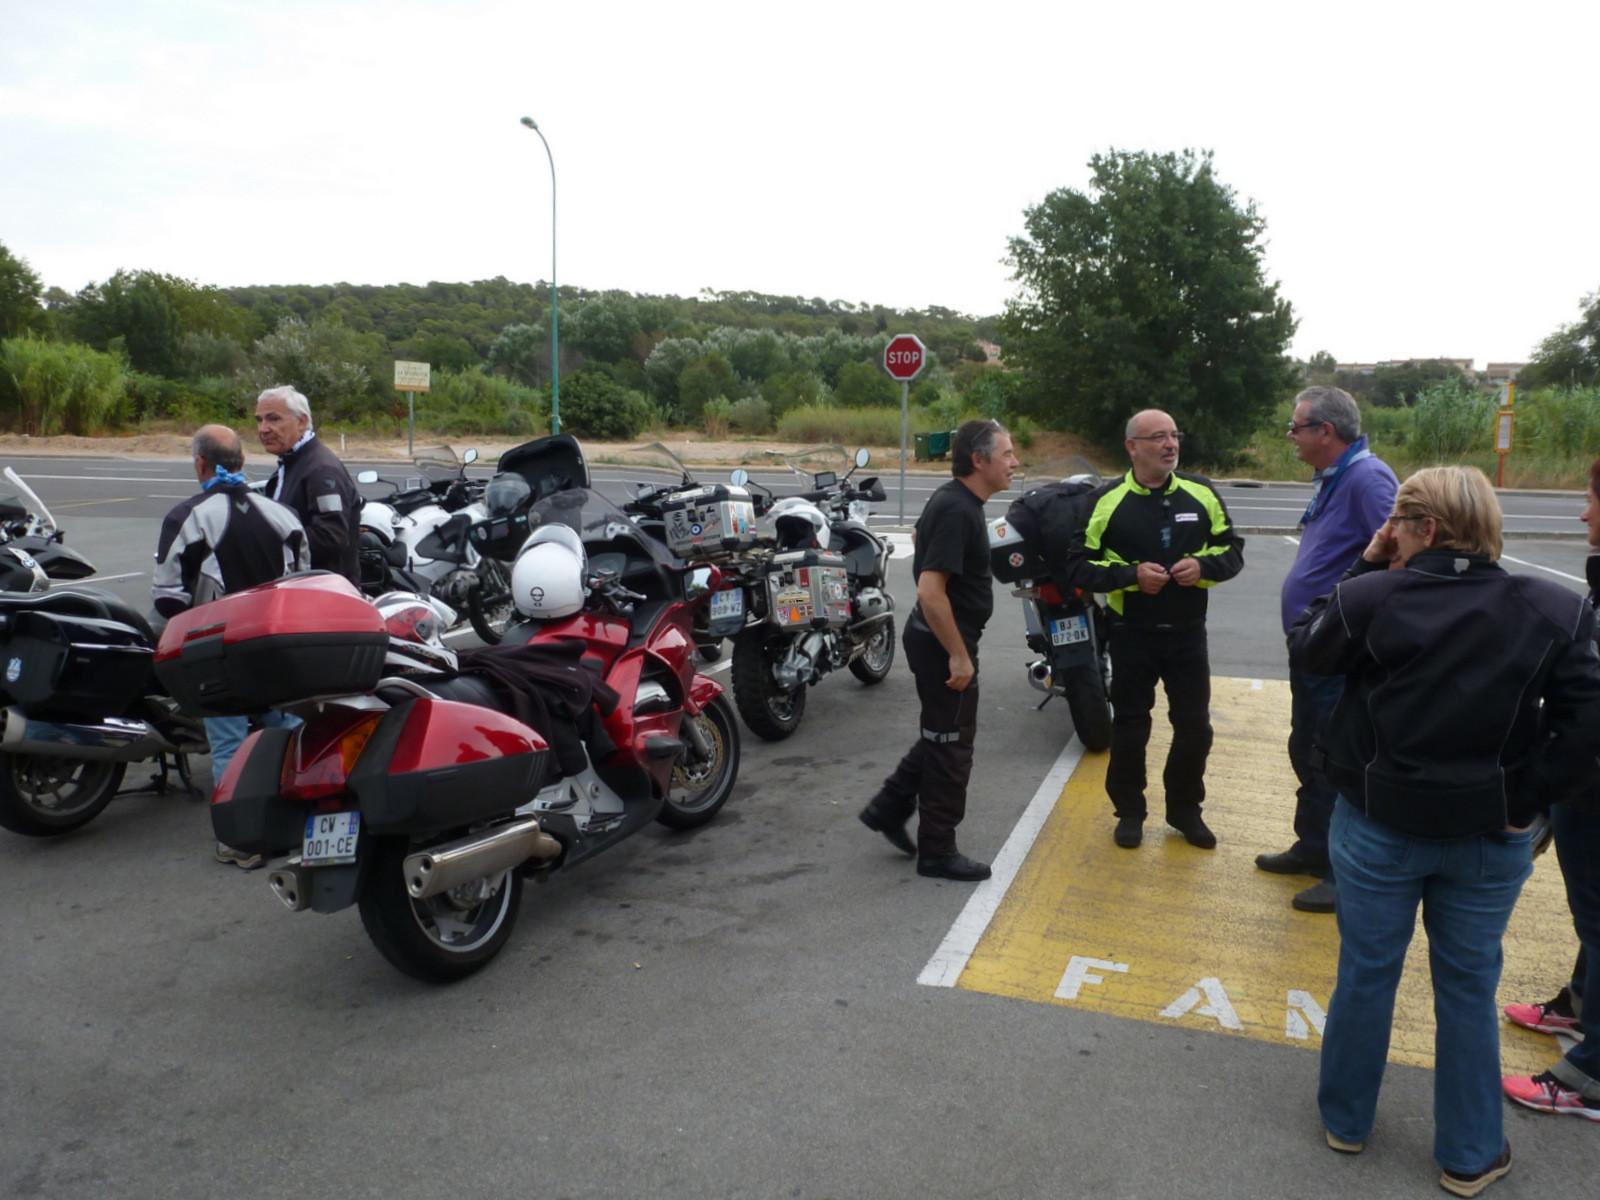 petit groupe de 9 motos